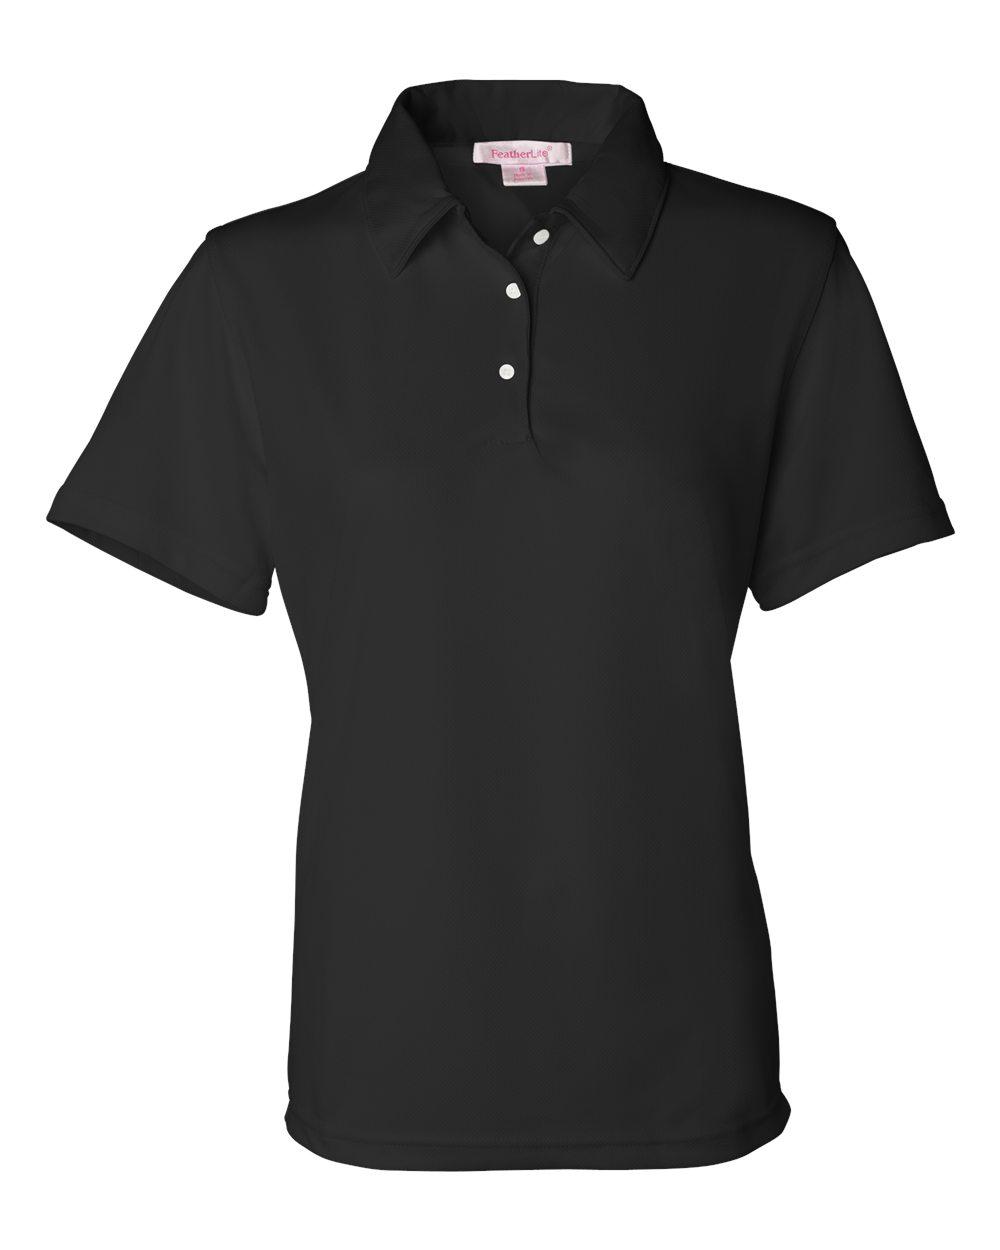 Women's Moisture Free Mesh Sport Shirt